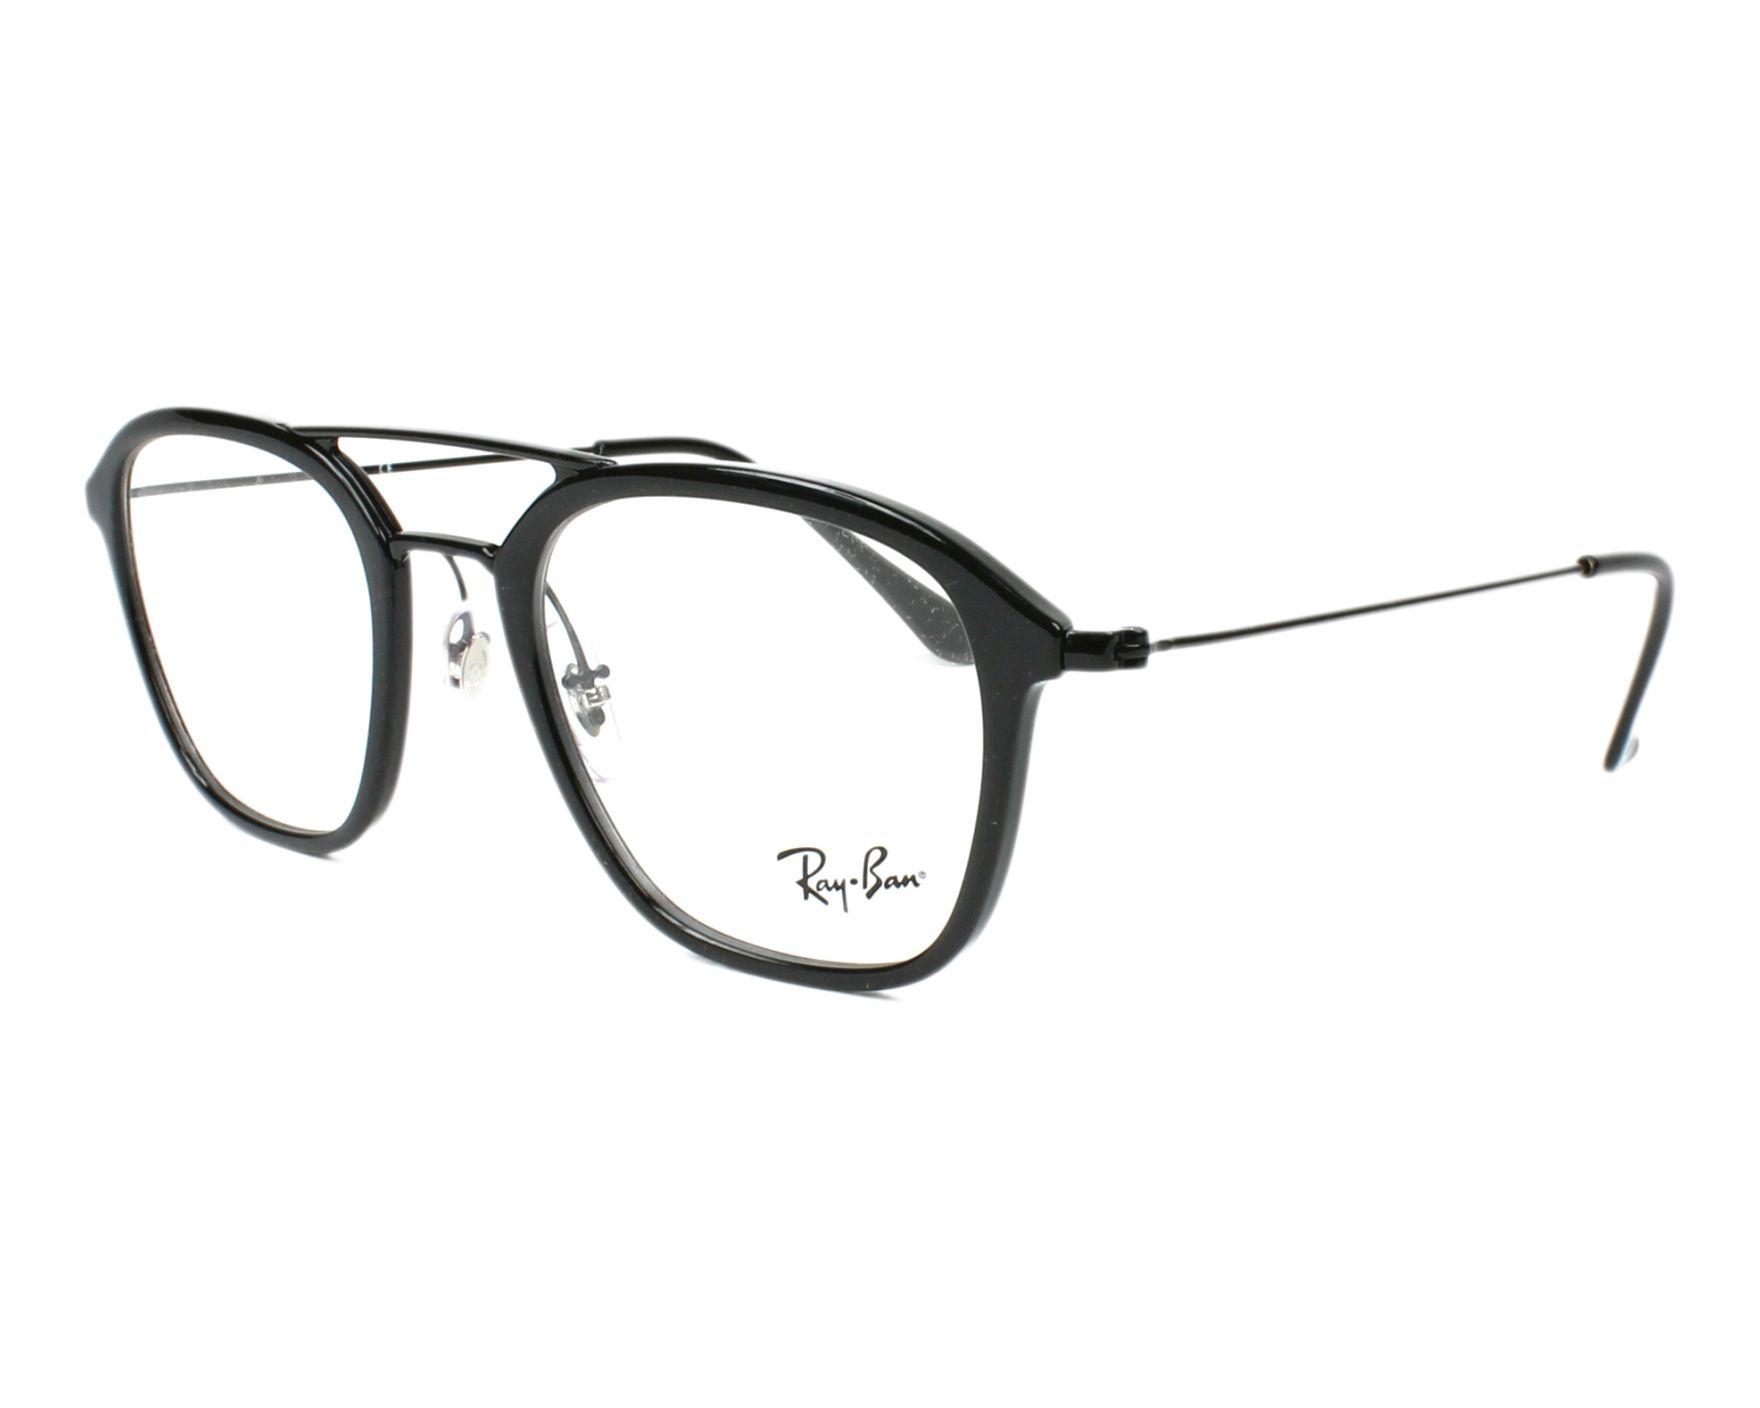 ba749c8a0f eyeglasses Ray-Ban RX-7098 5725 48-21 Black profile view